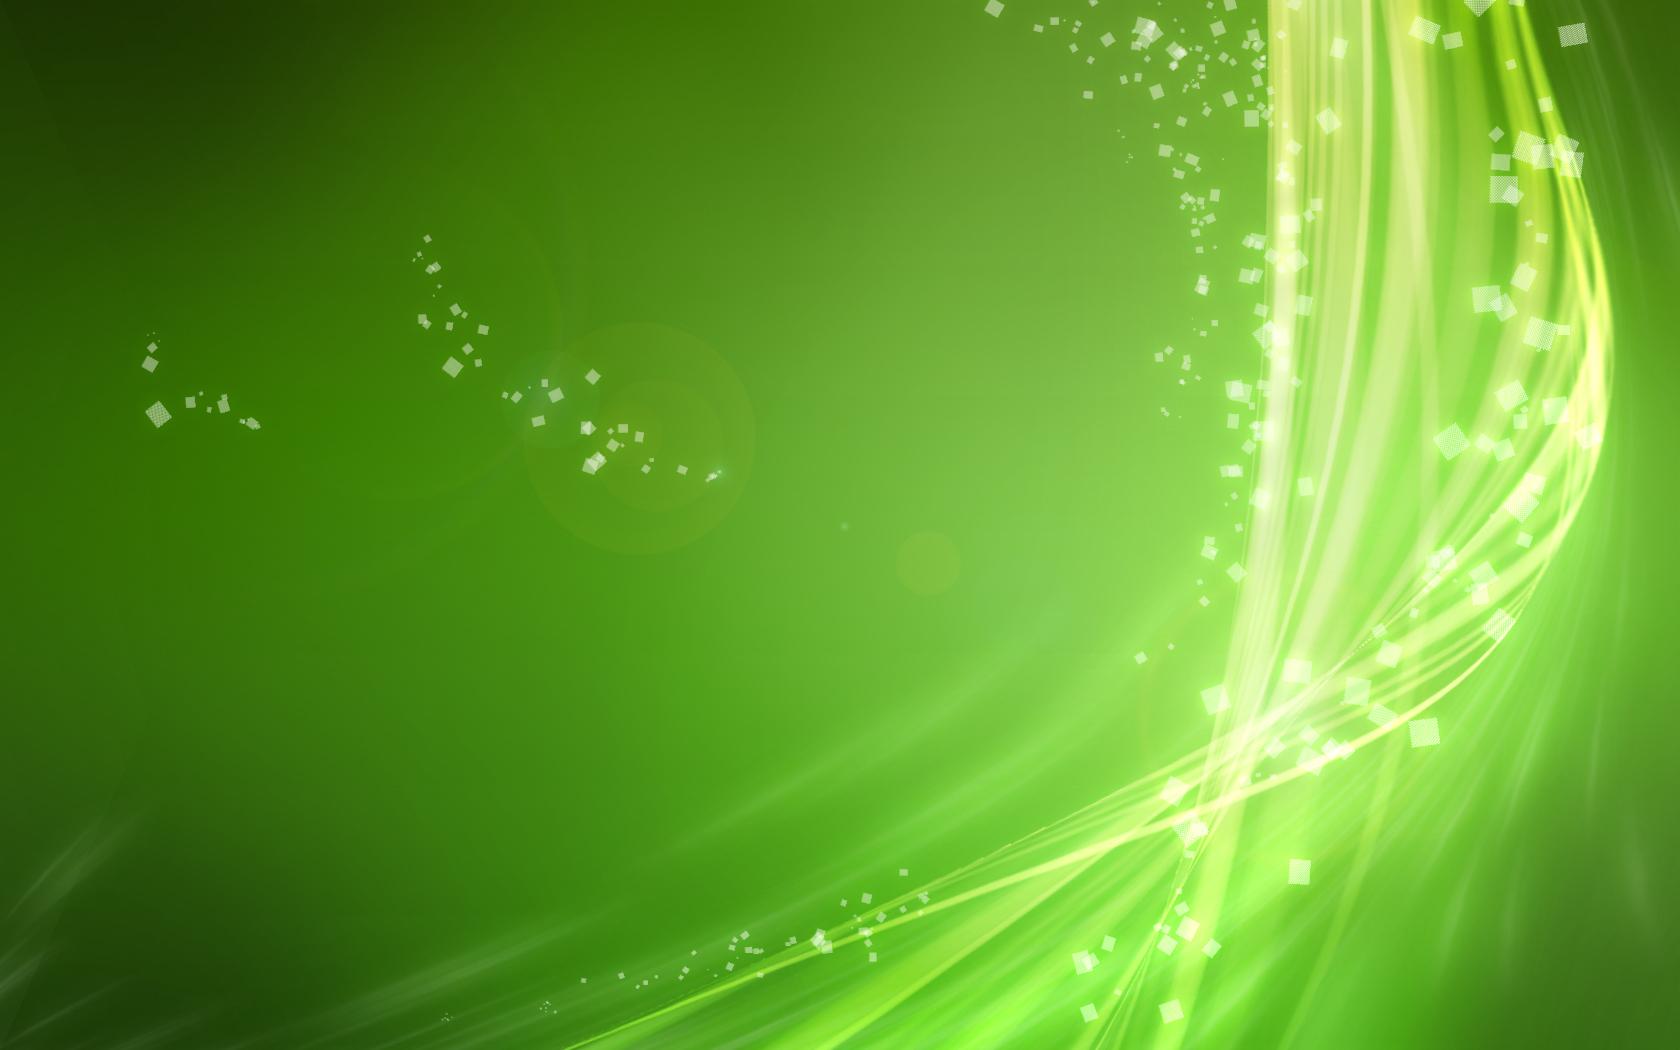 Abstract Green Wallpaper